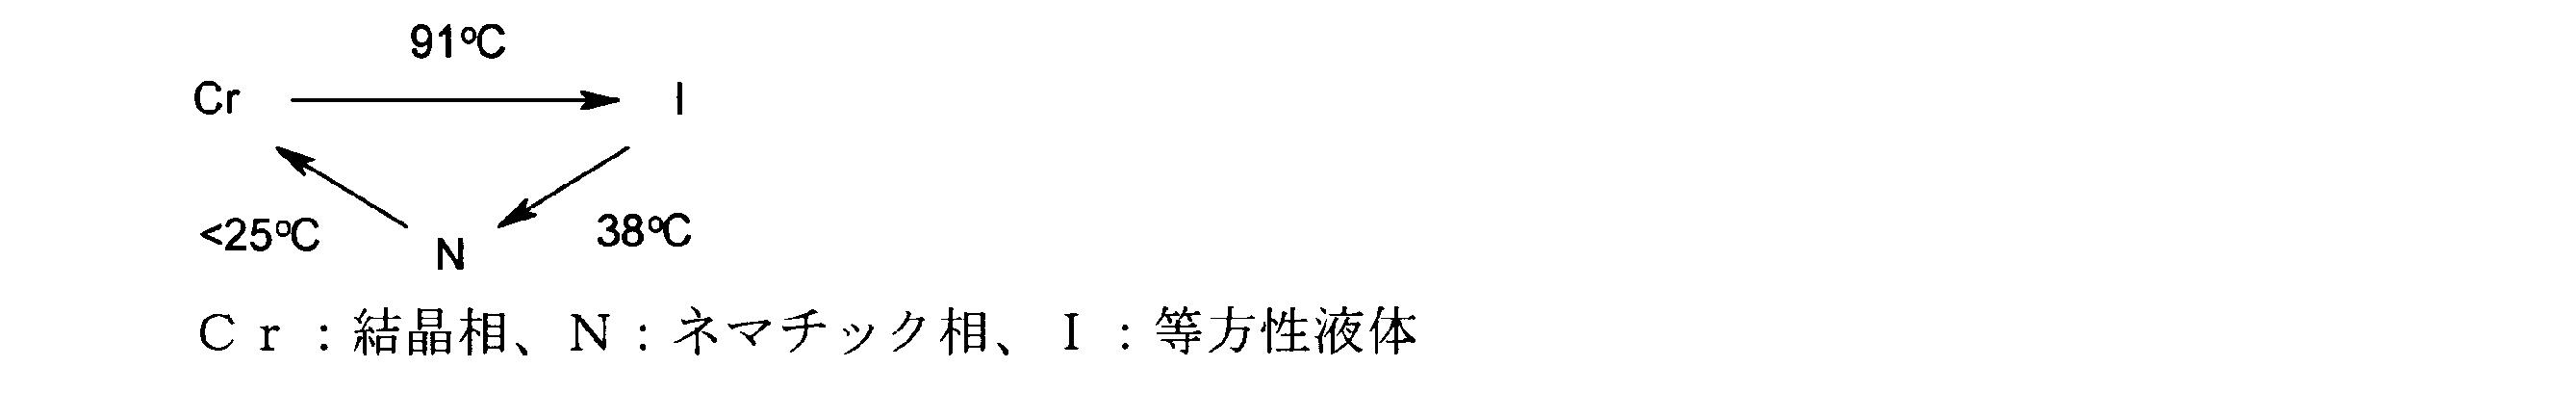 WO2009122868A1 - 三官能(メタ)アクリレート化合物及び該化合物を含有する重合性組成物         - Google PatentsFamily